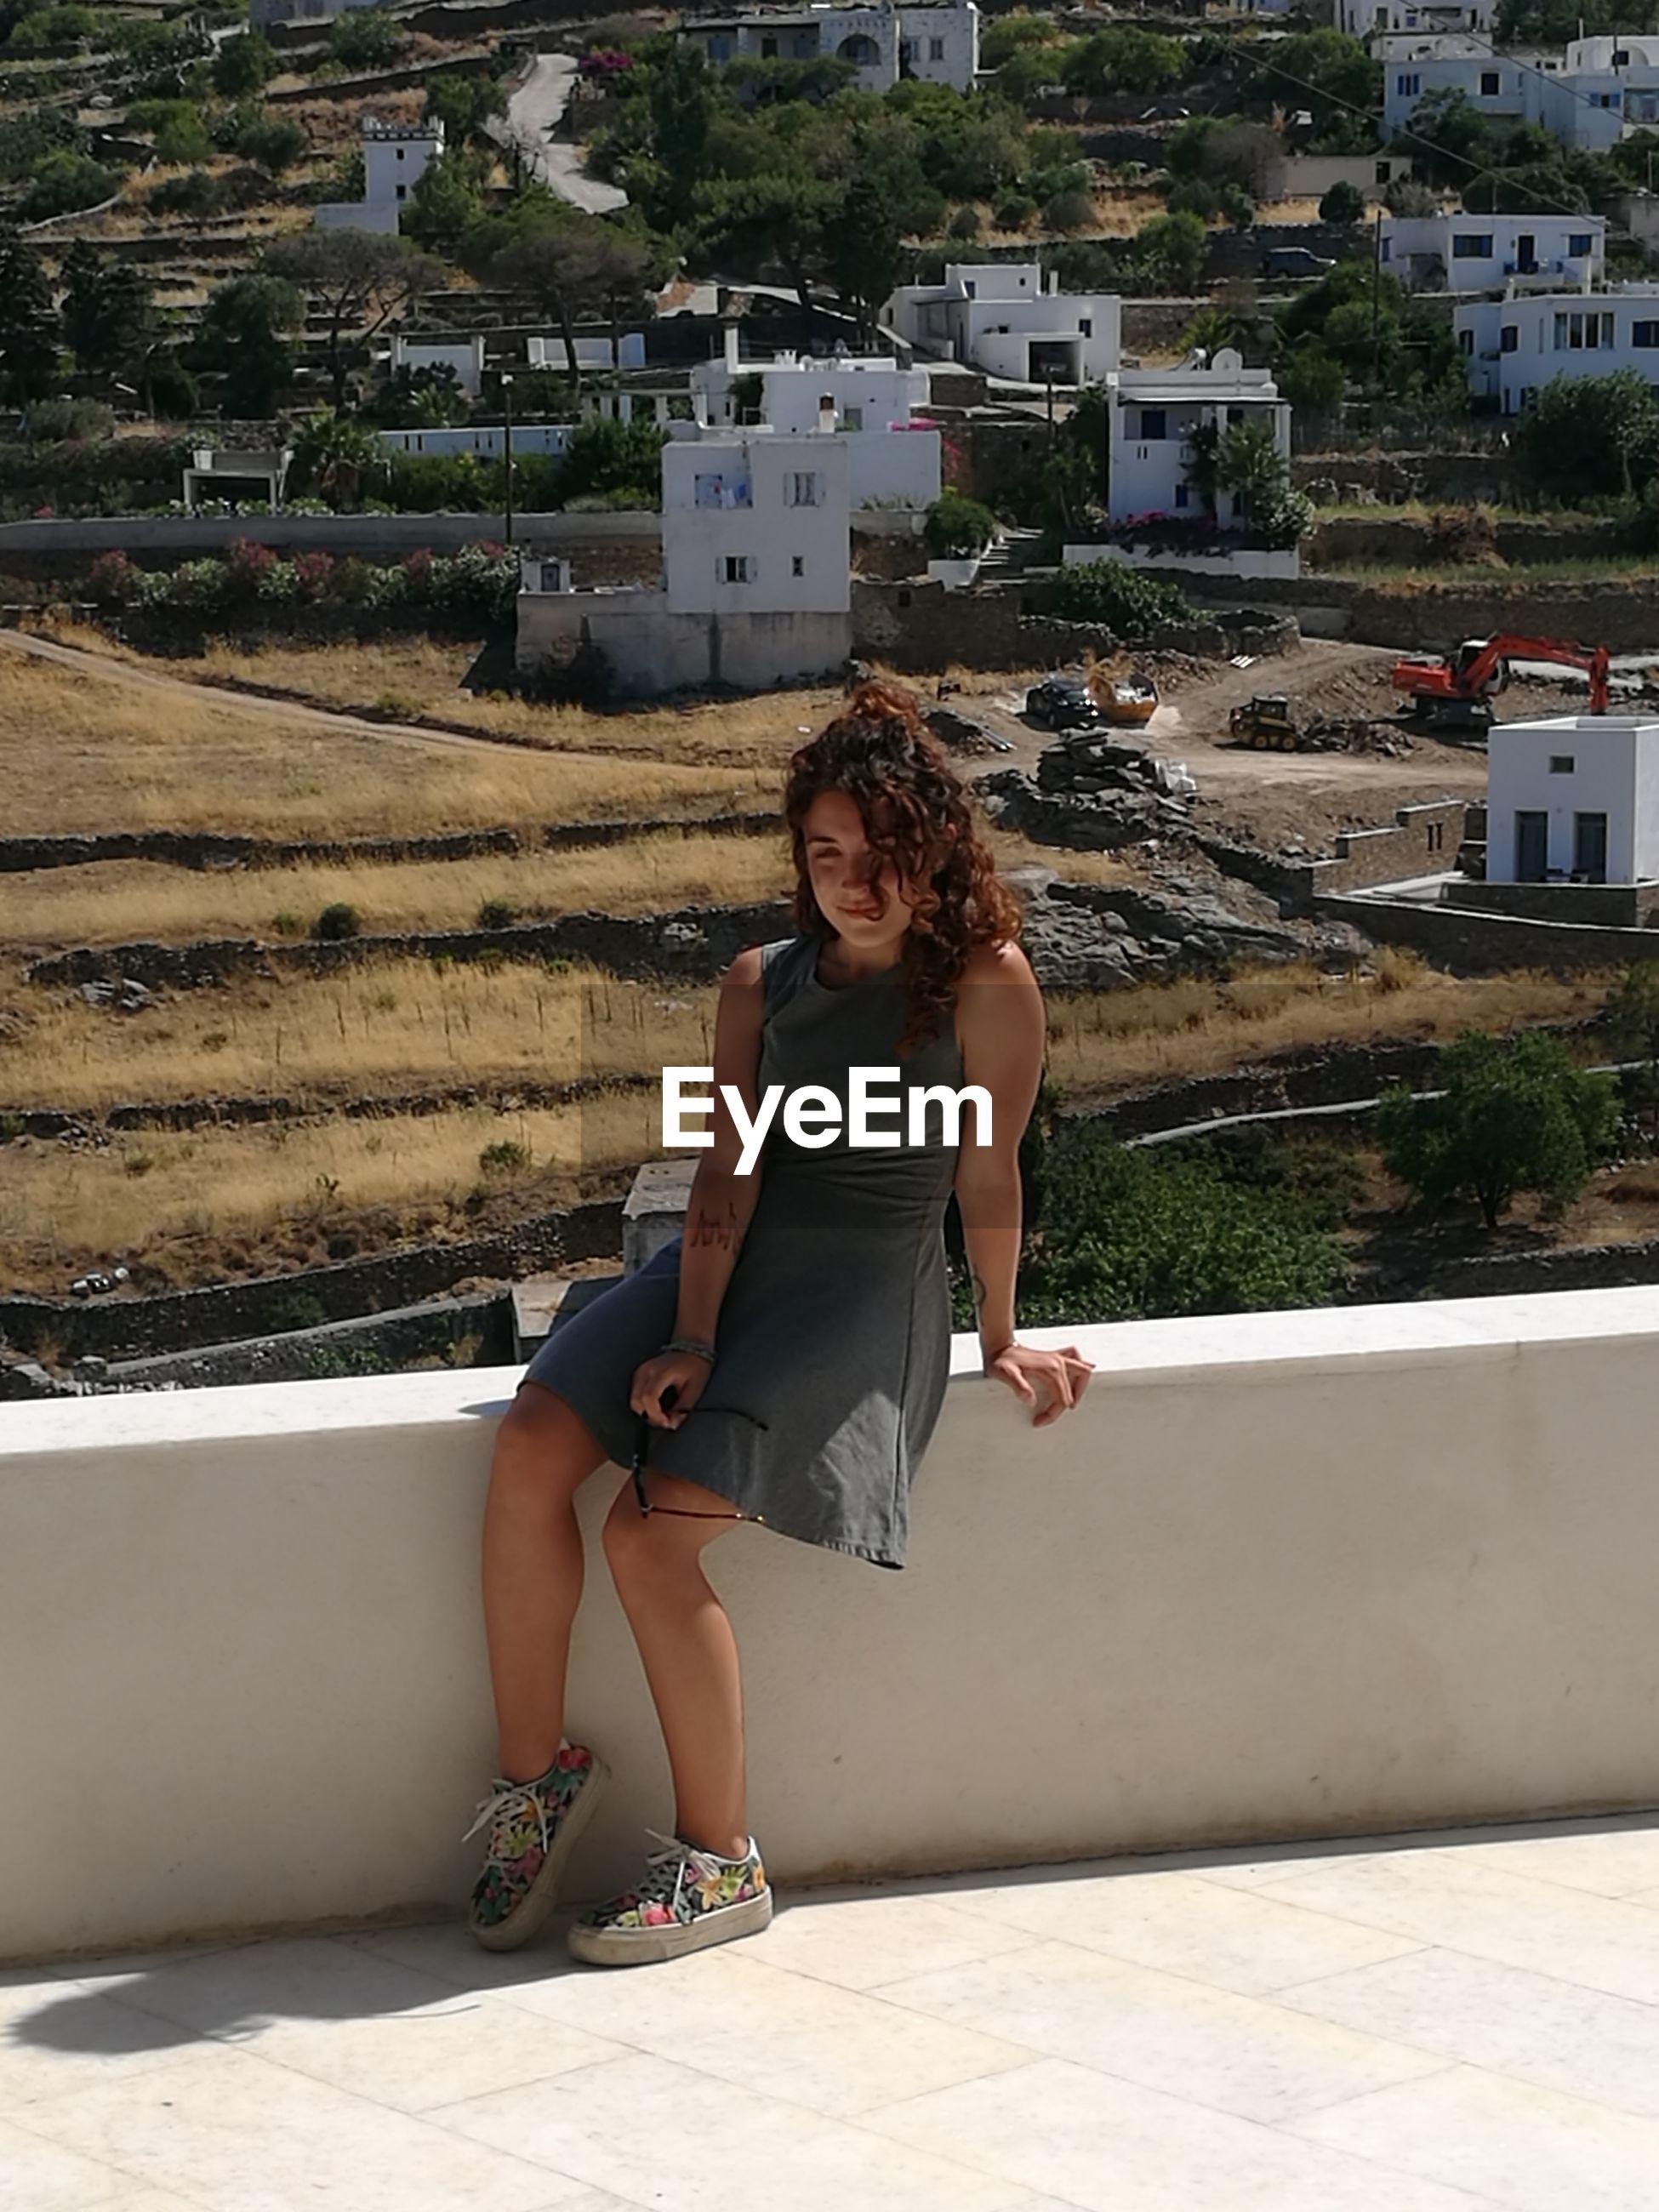 Full length of teenage girl sitting on railing against buildings